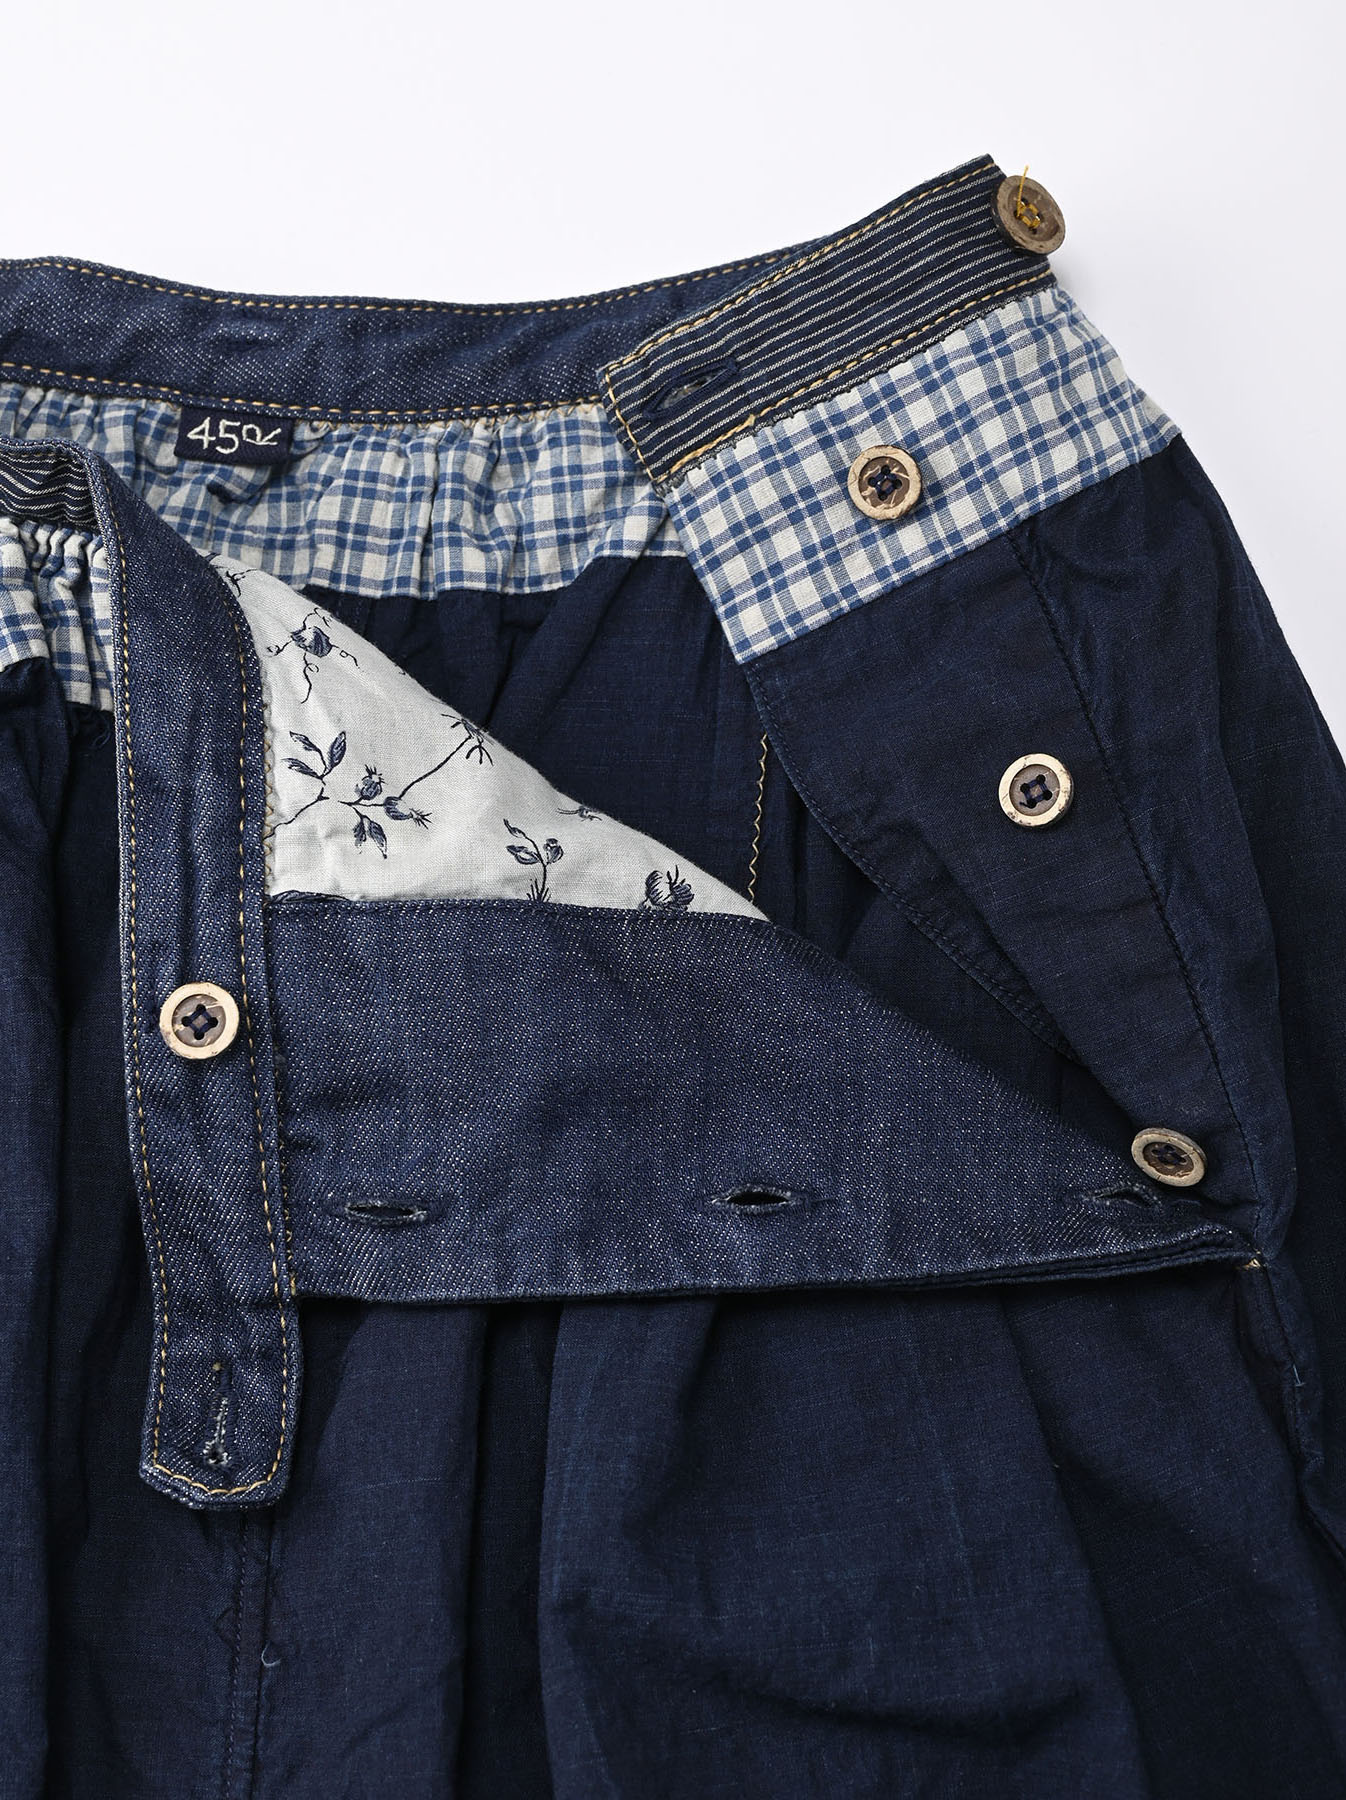 Indigo Tappet Patchwork Skirt-7